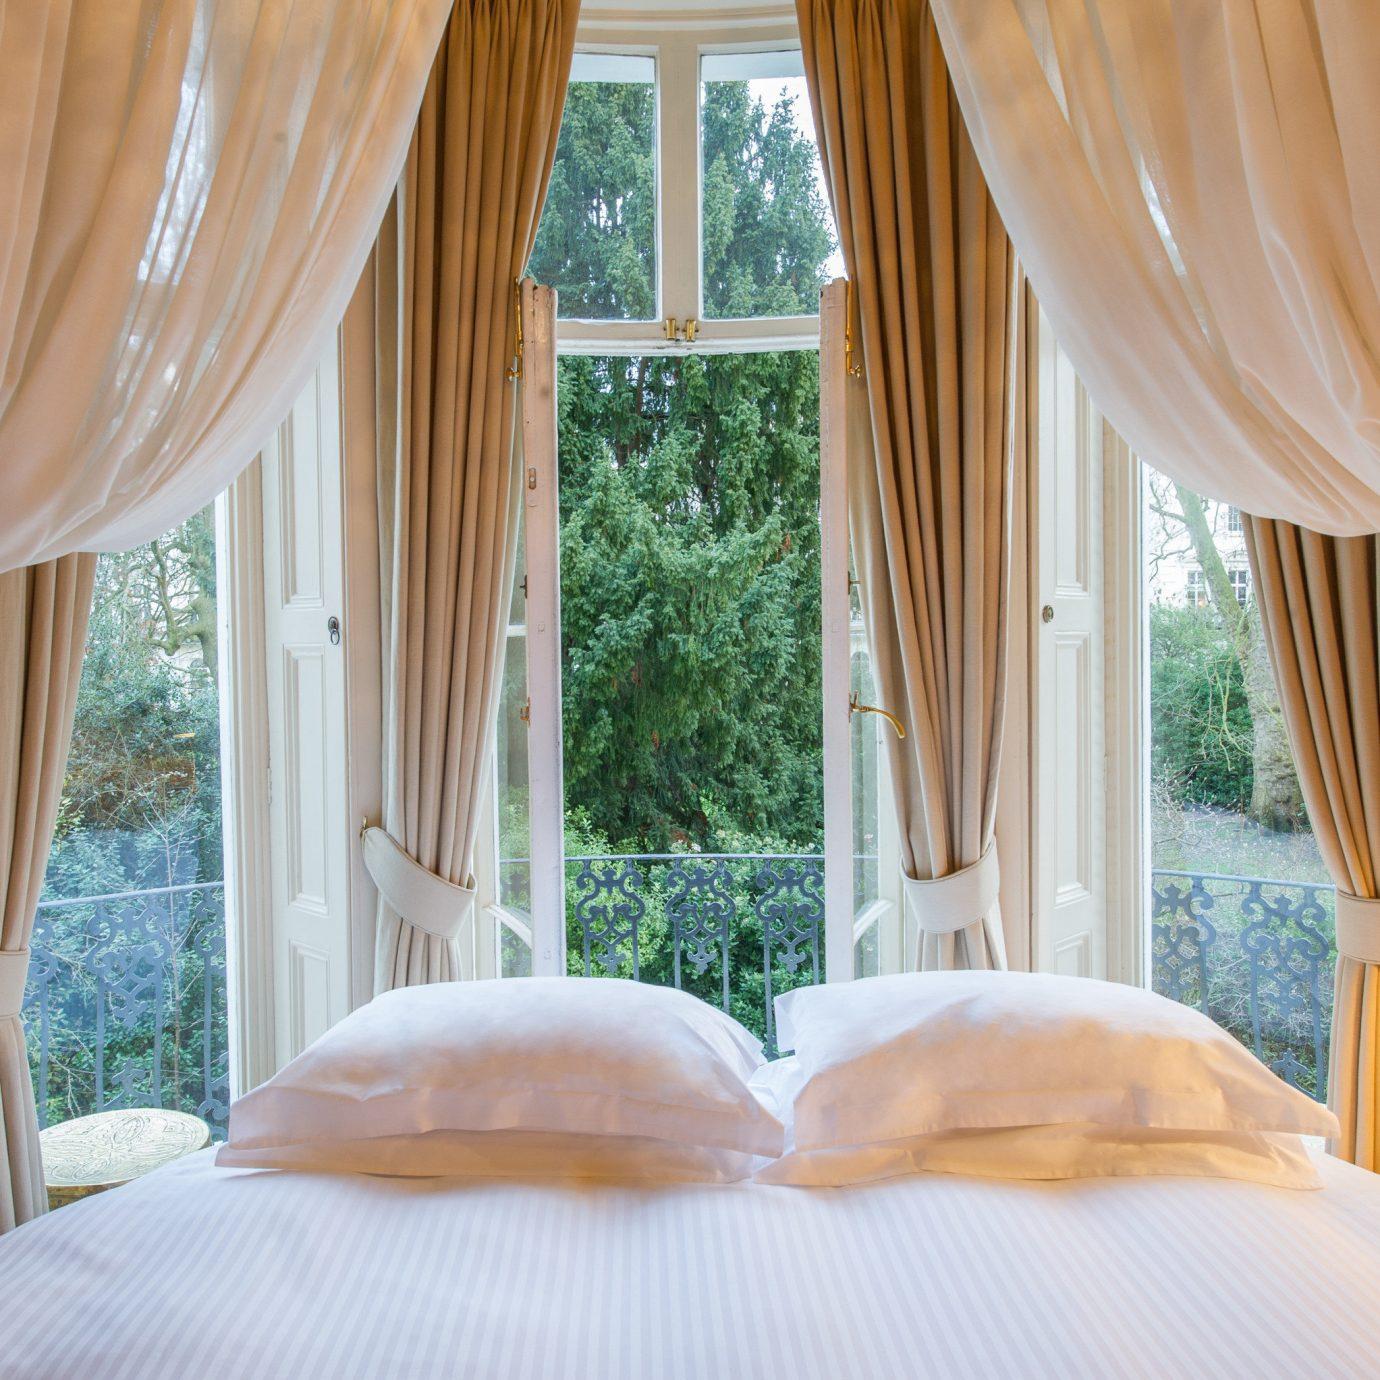 curtain chair Bedroom textile window treatment